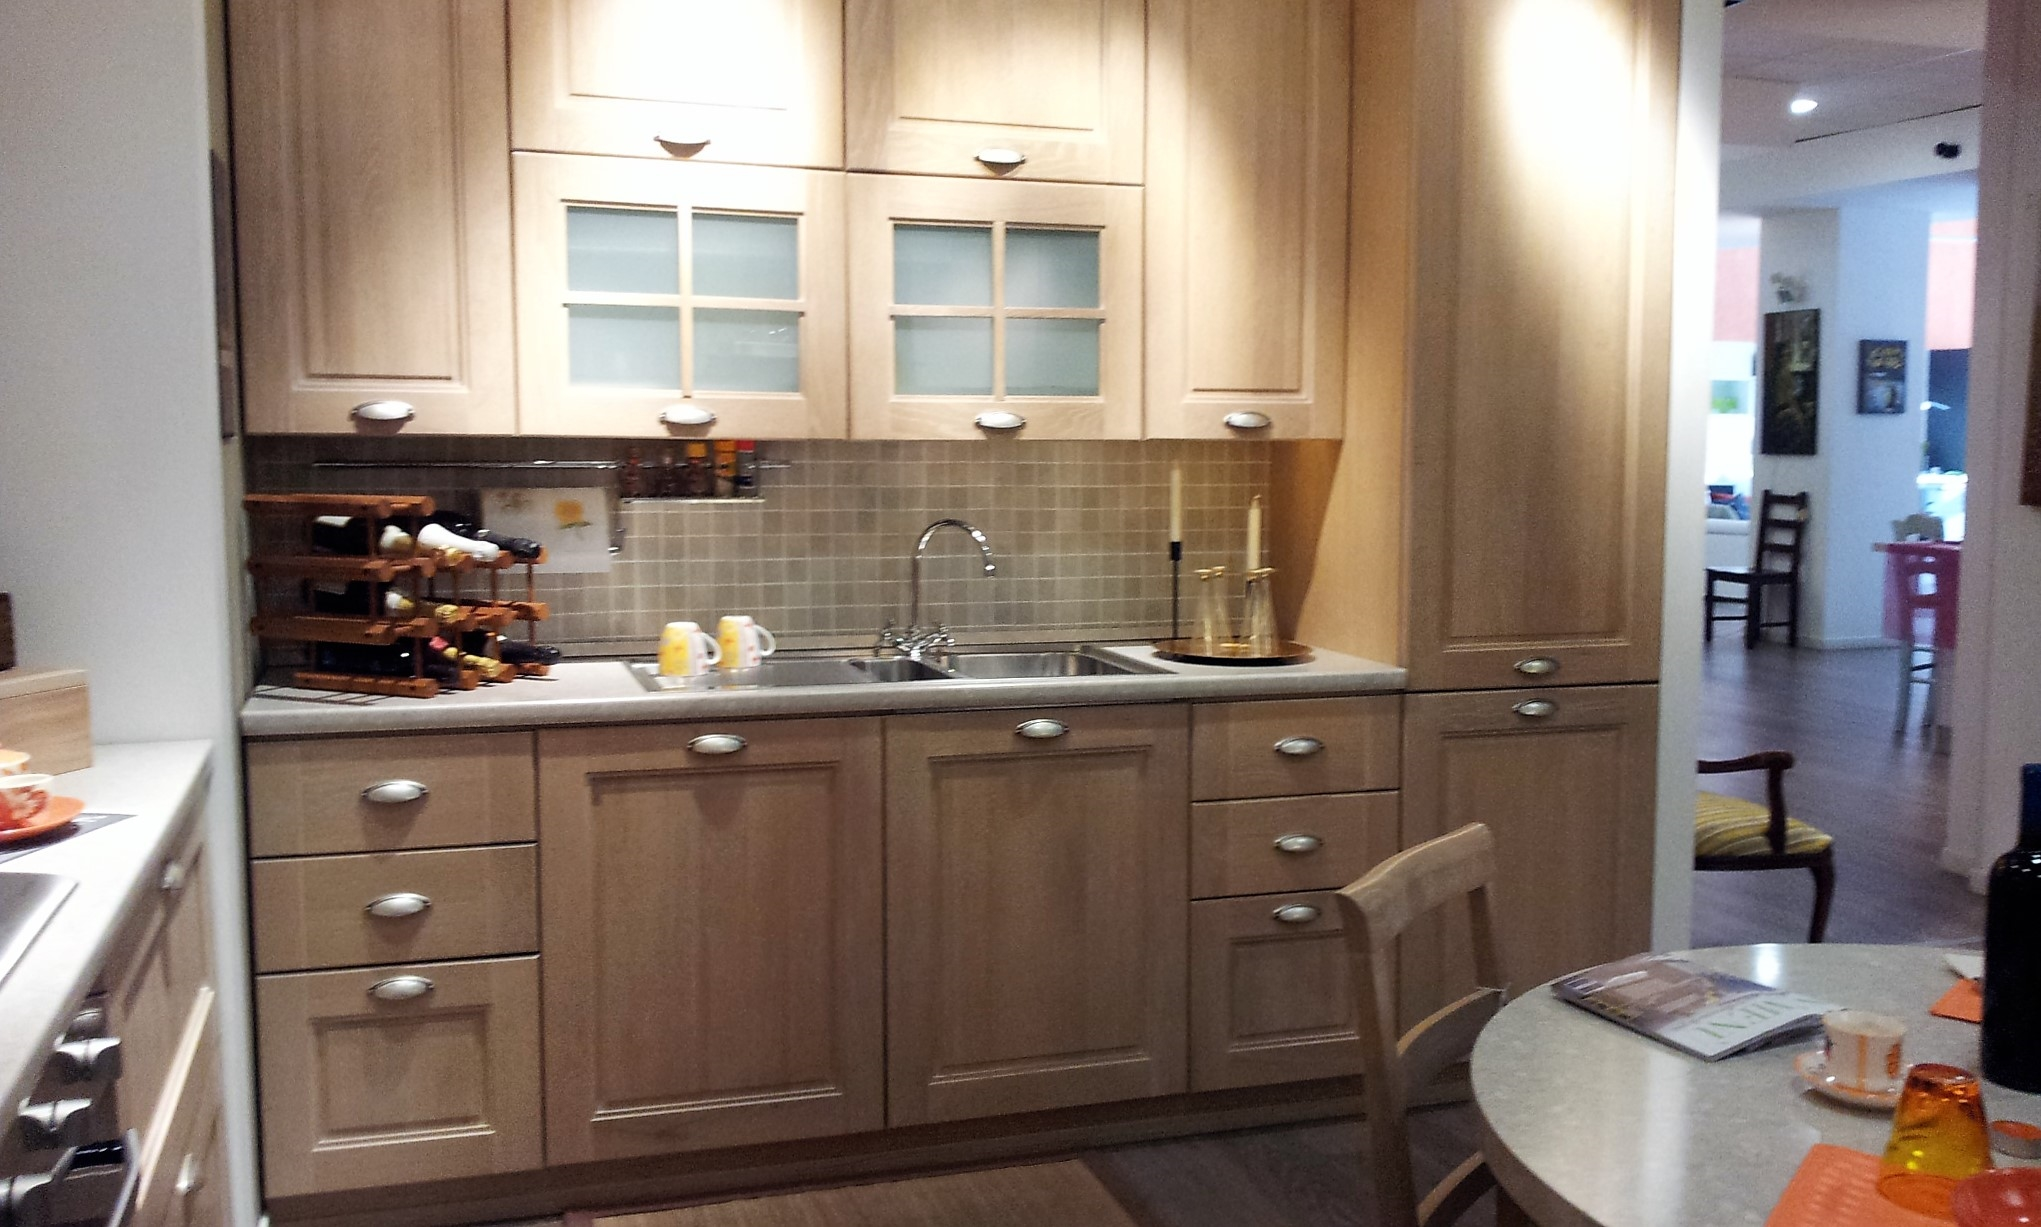 Pin cucina stosa ontario rovere gessato mostra arredamento - Cucina rovere sbiancato e bianco ...